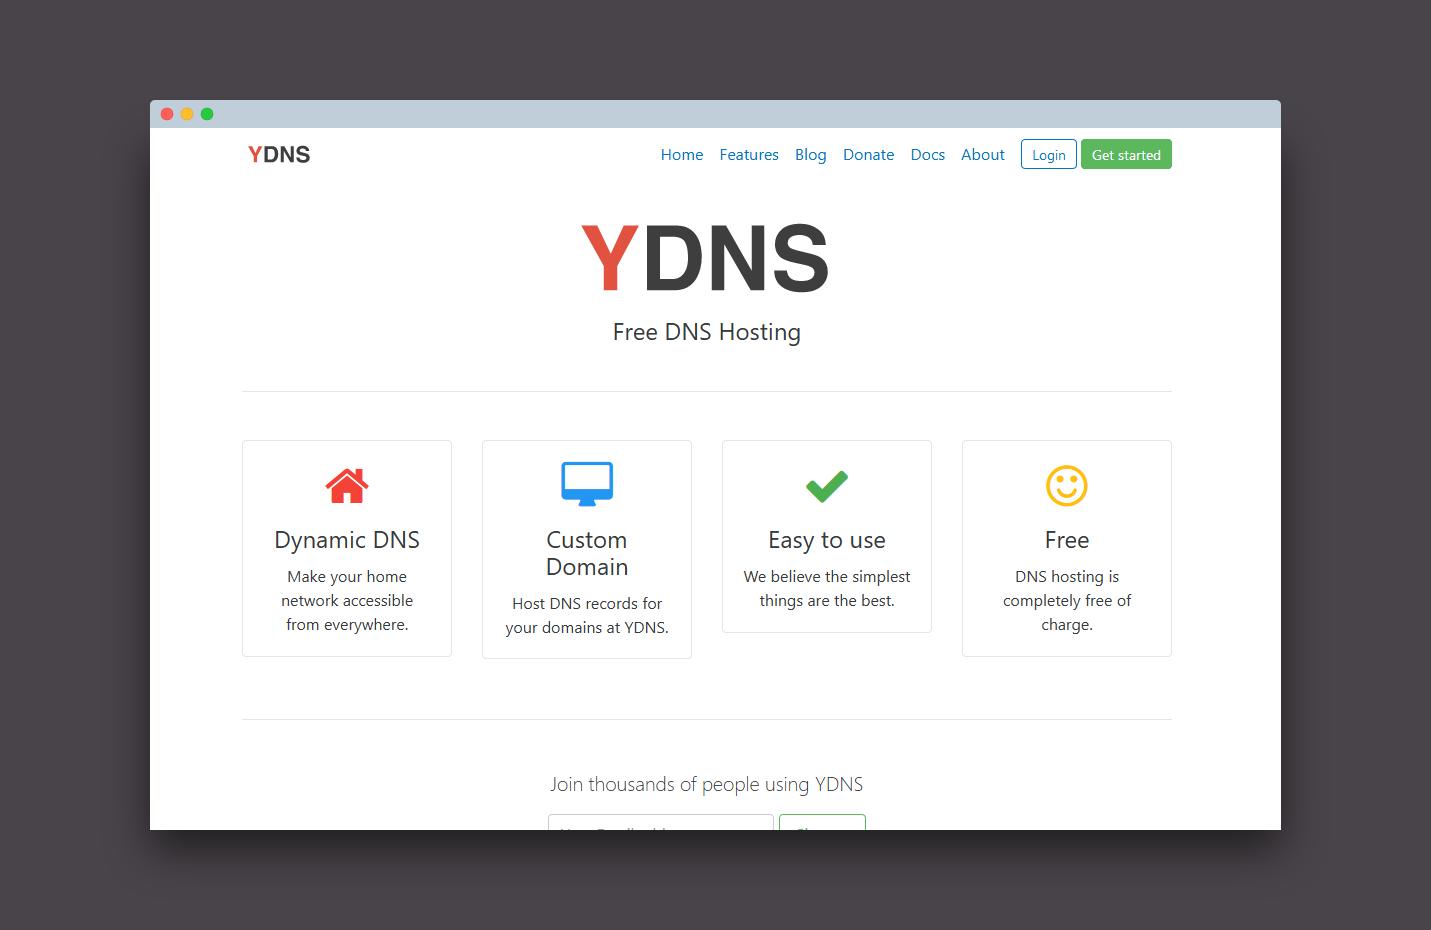 DtDNS will shut down on August 1, 2018